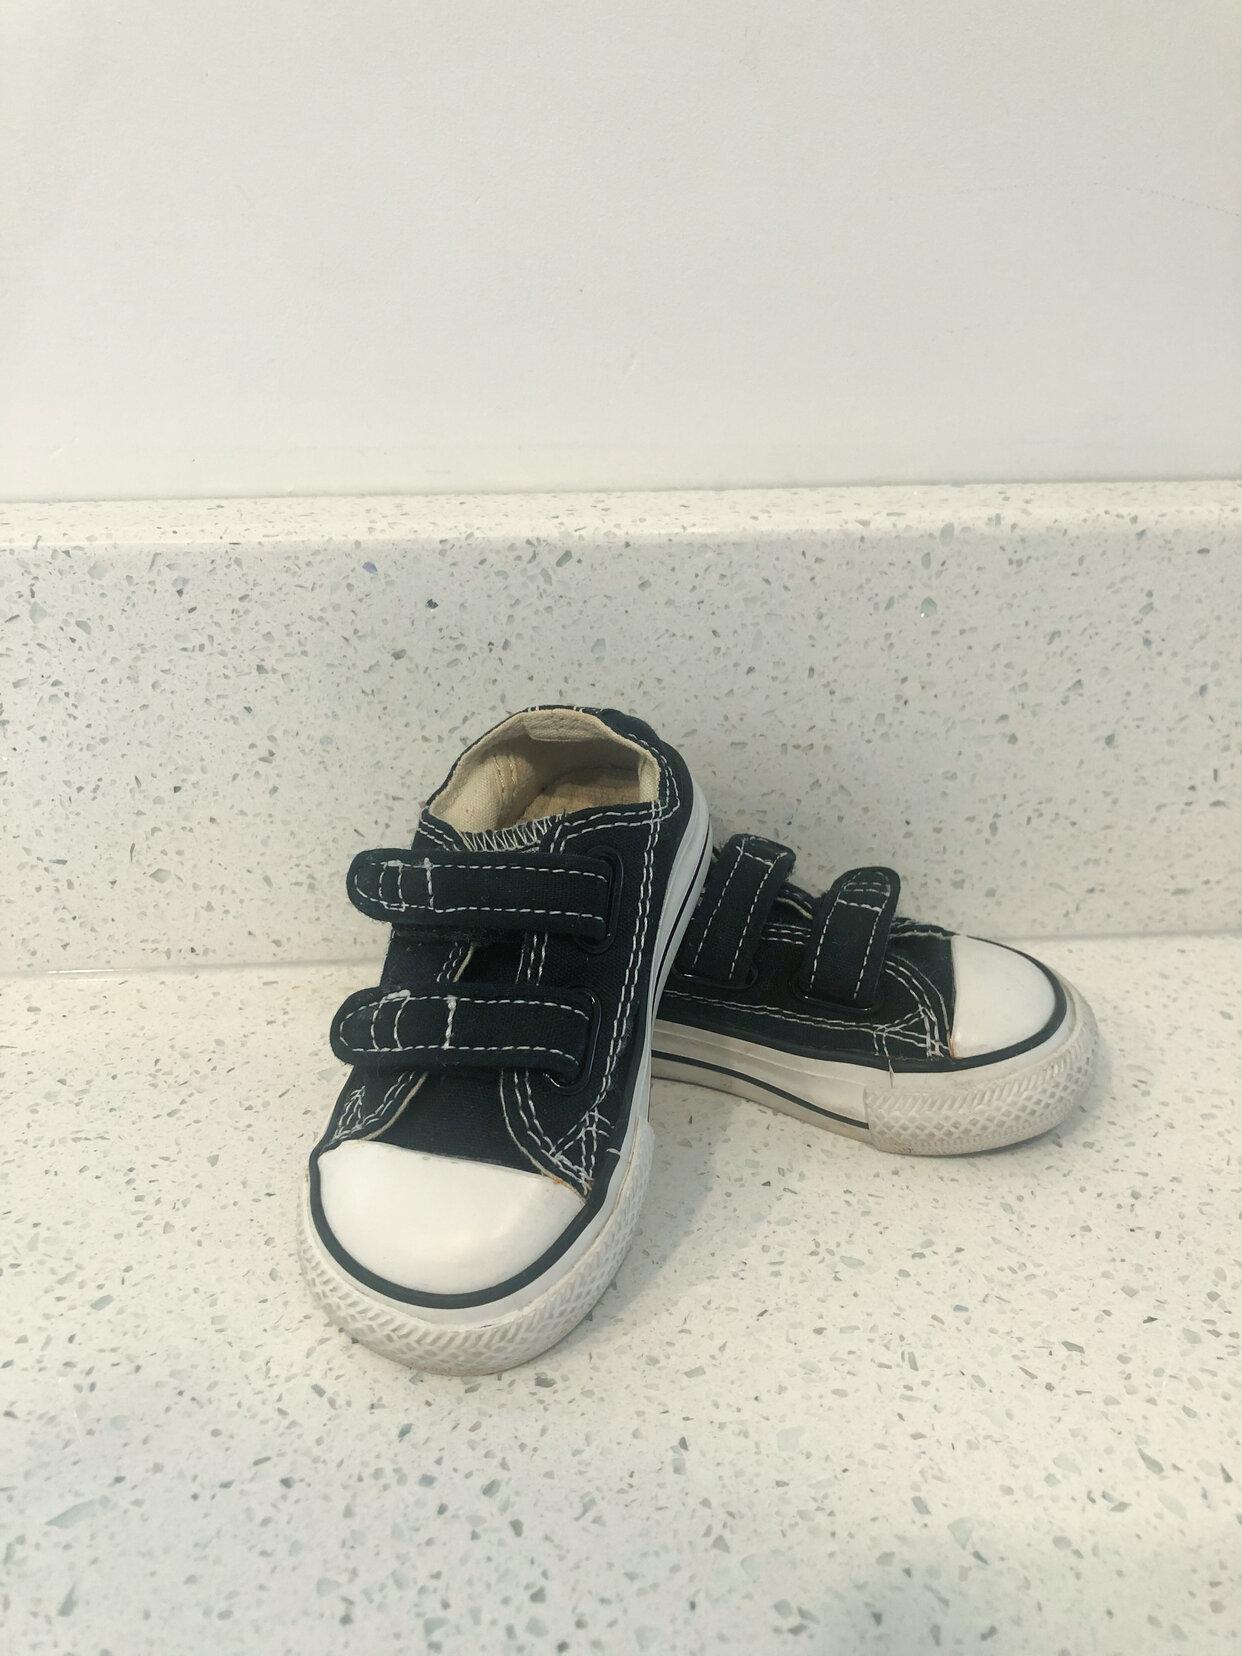 Converse velcro sneakers